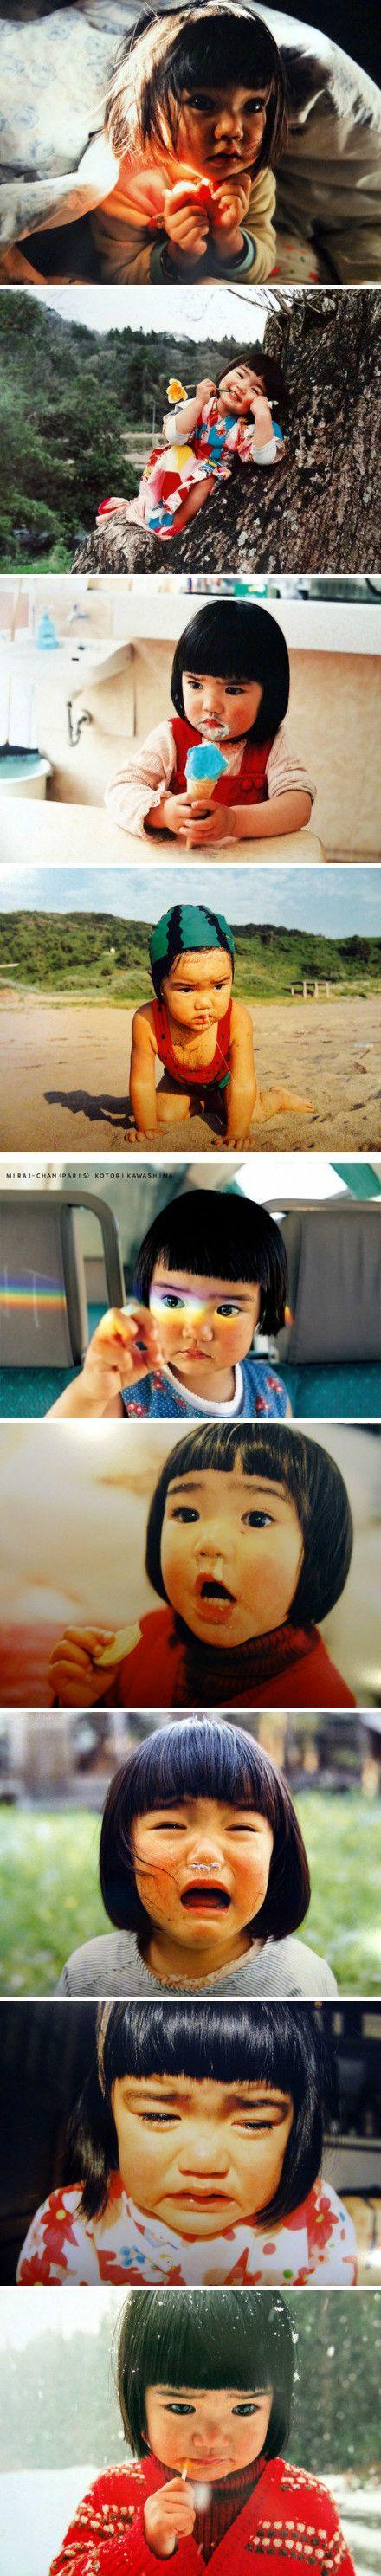 Mirai Chan by Kawashima Kotori // In LOVE with this photography series